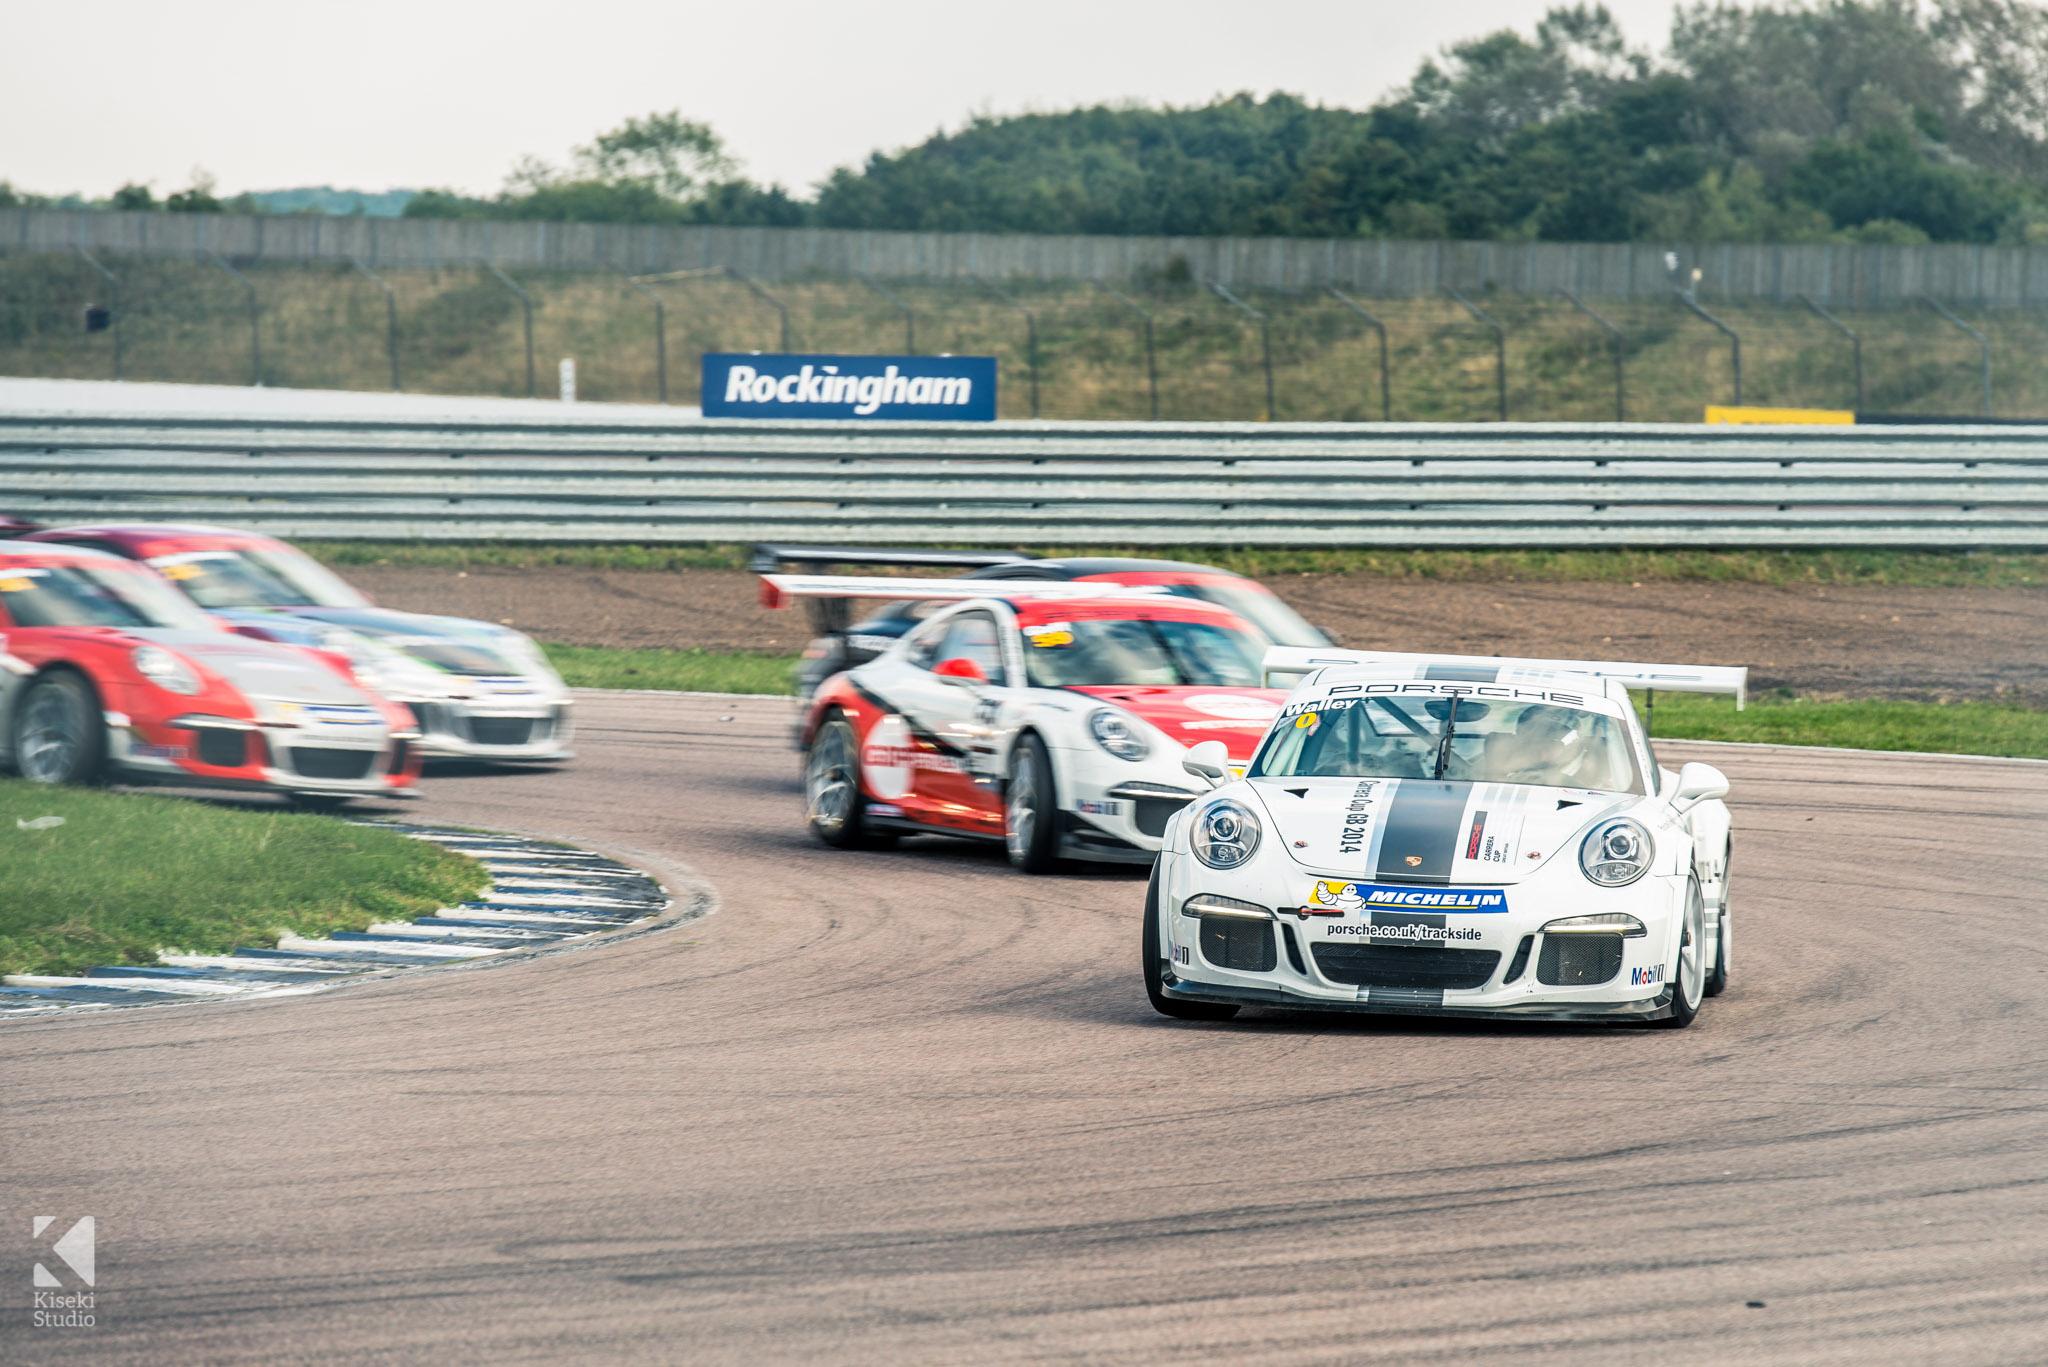 Porsche Carrera Cup at Rockingham in action